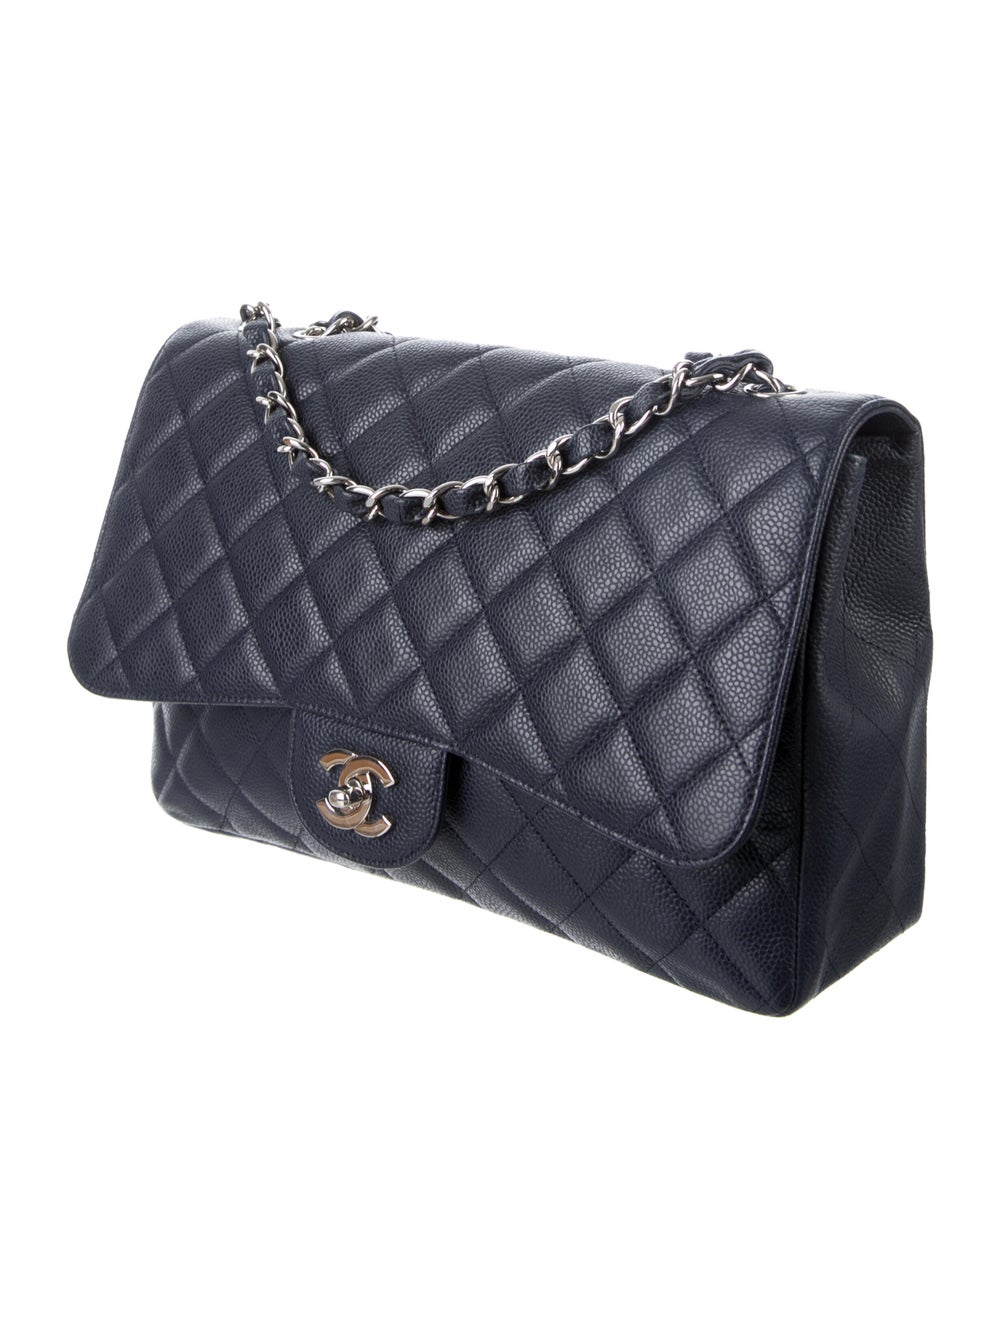 Chanel Jumbo Single Flap Bag Blue - image 3